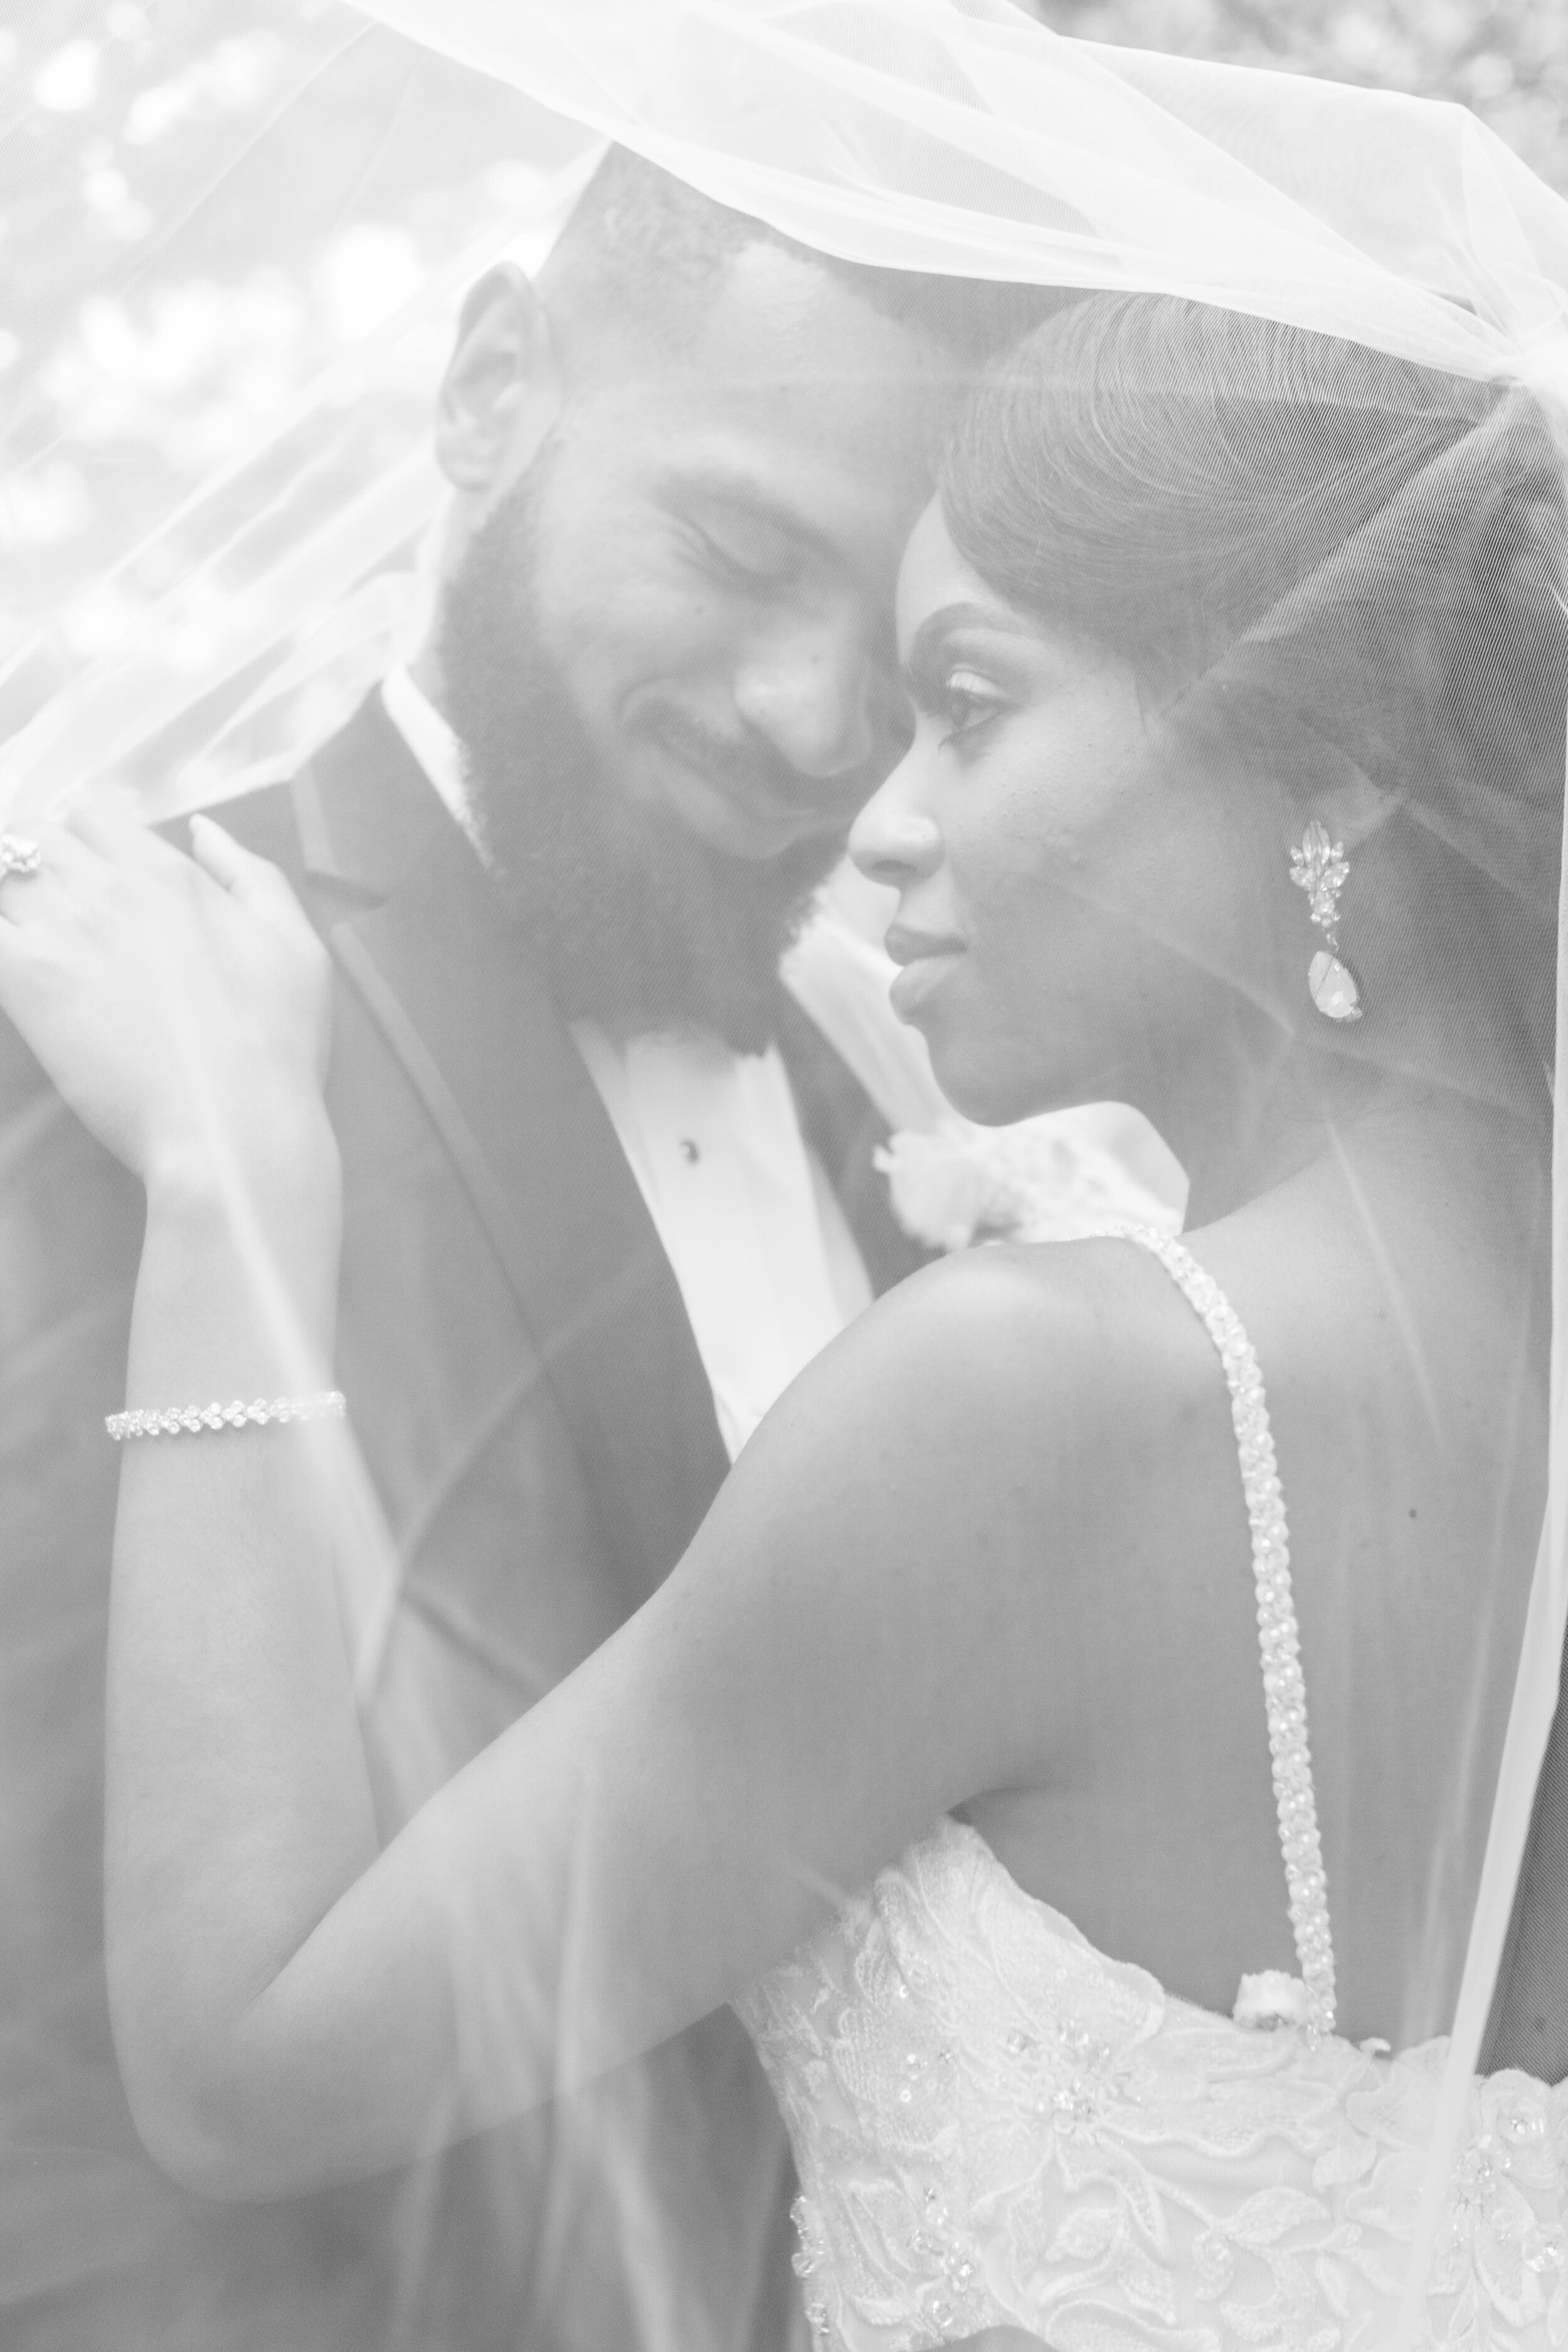 8_3_2019_BONTY_WEDDING-598.jpg